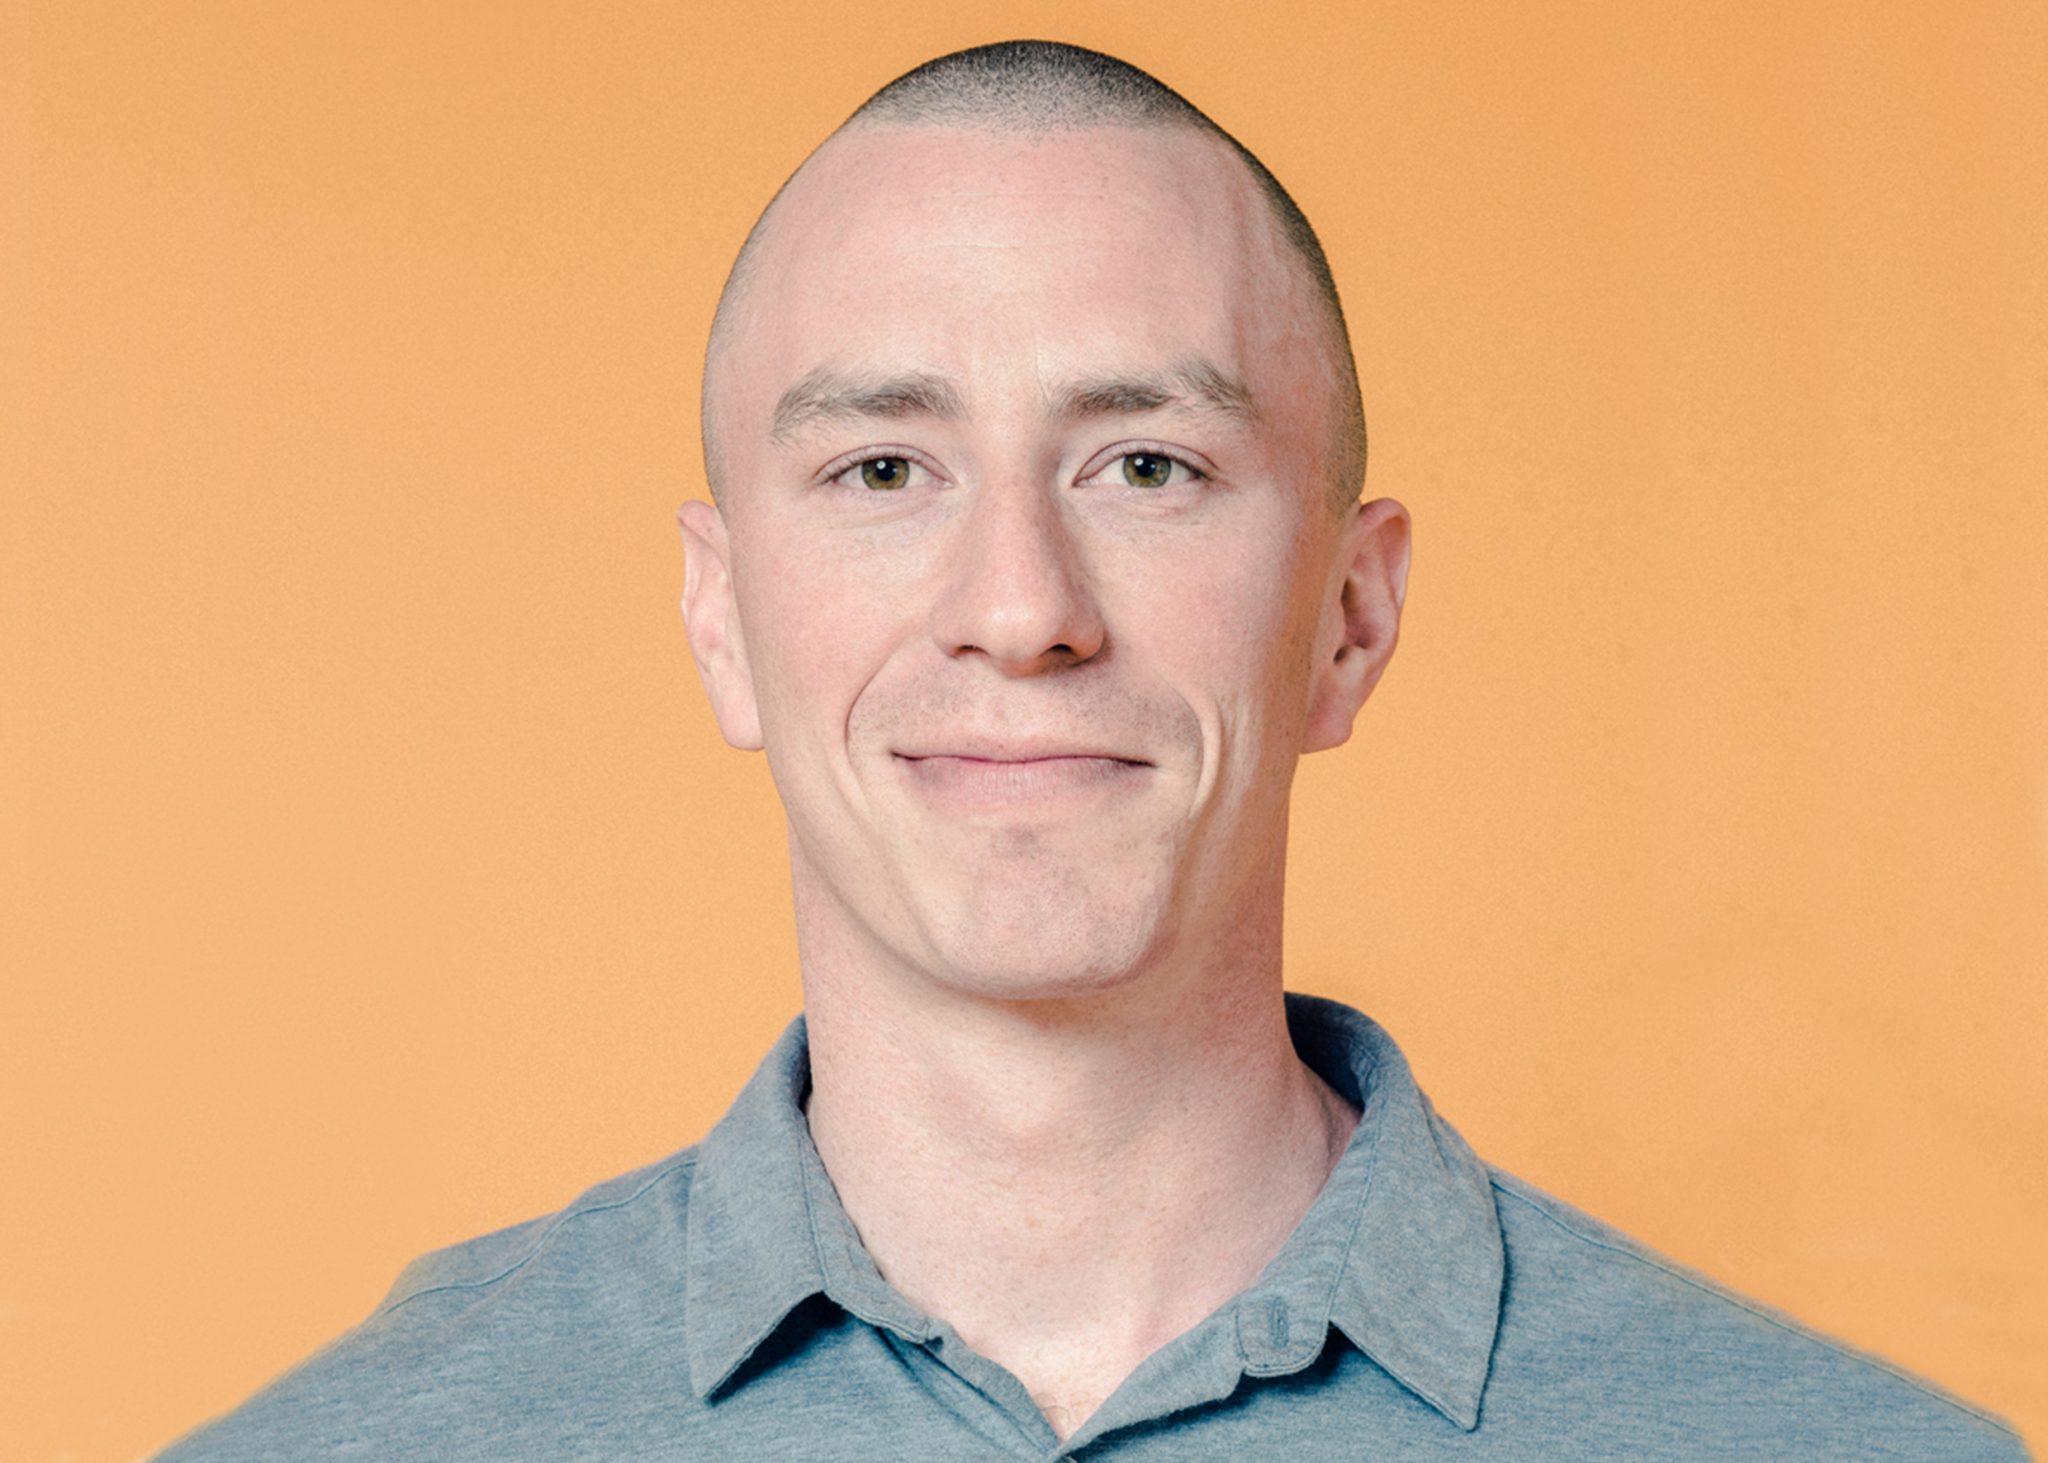 Photo of Dan Garrett, CEO of legal tech startup Farewill.